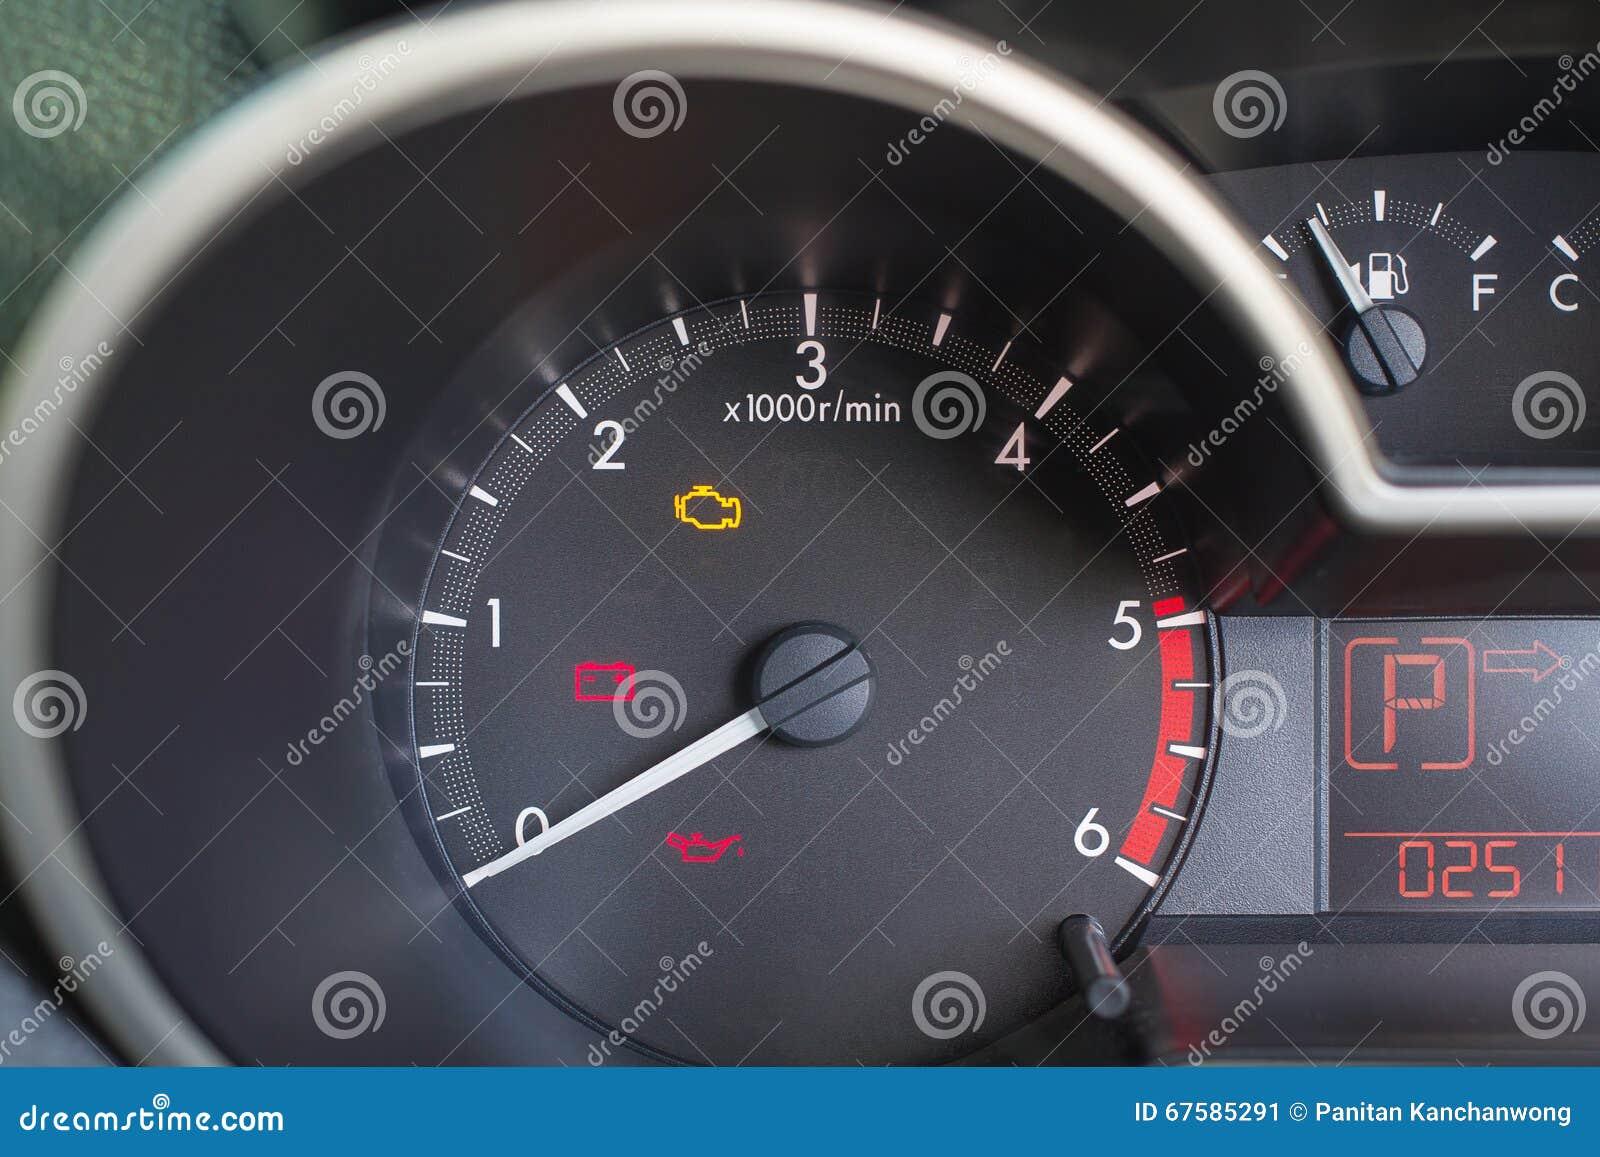 tableau de bord de vitesse de voiture image stock image 67585291. Black Bedroom Furniture Sets. Home Design Ideas